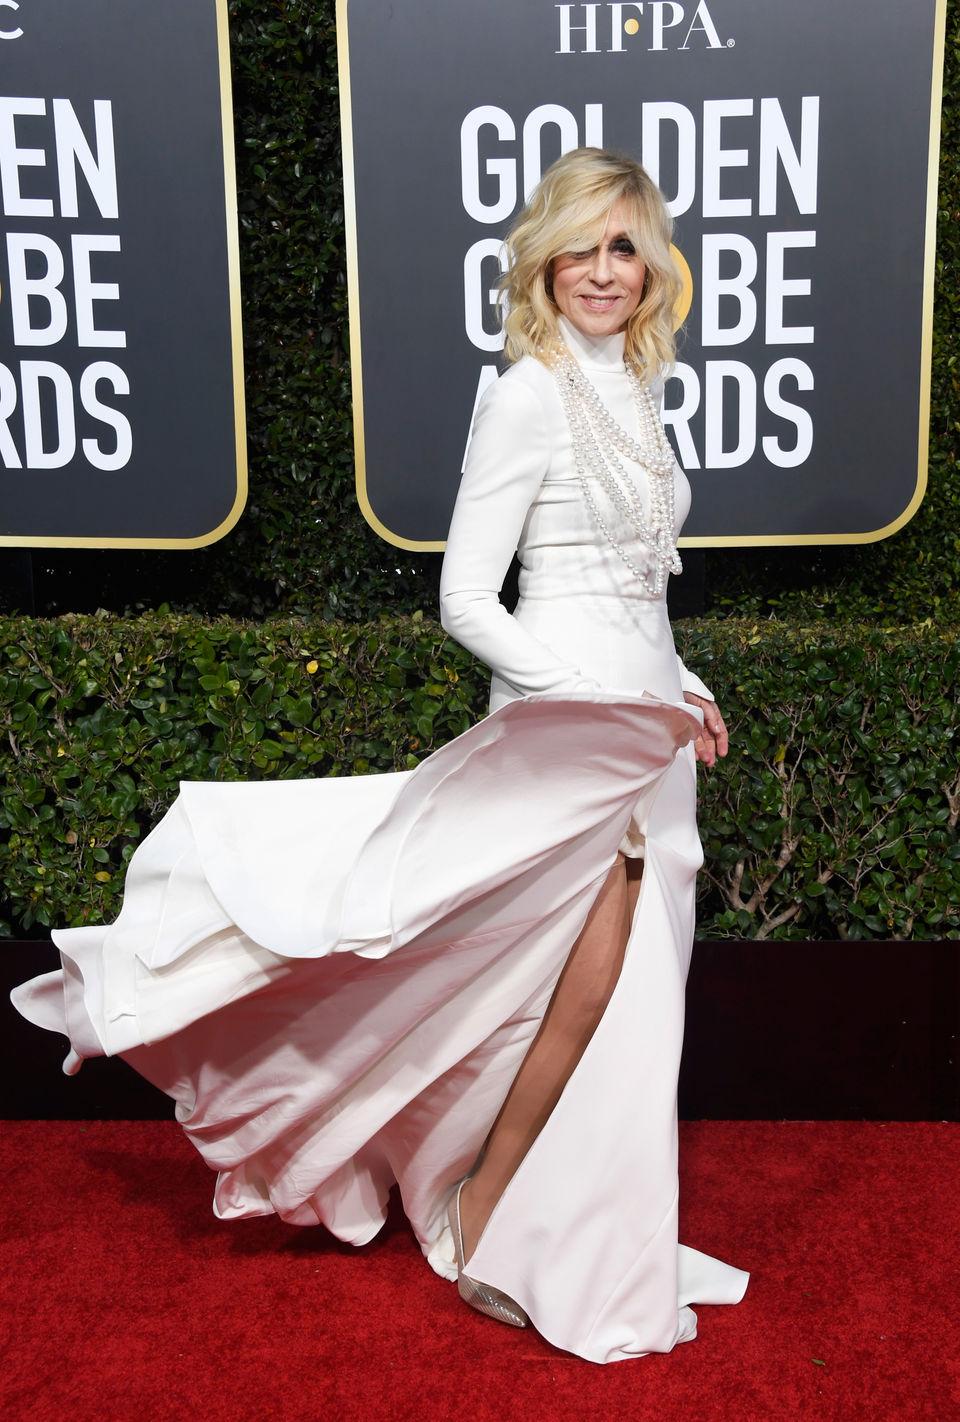 Best And Worst Dressed Golden Globes 2019 Golden Globes 2019: Best and worst dressed from the red carpet